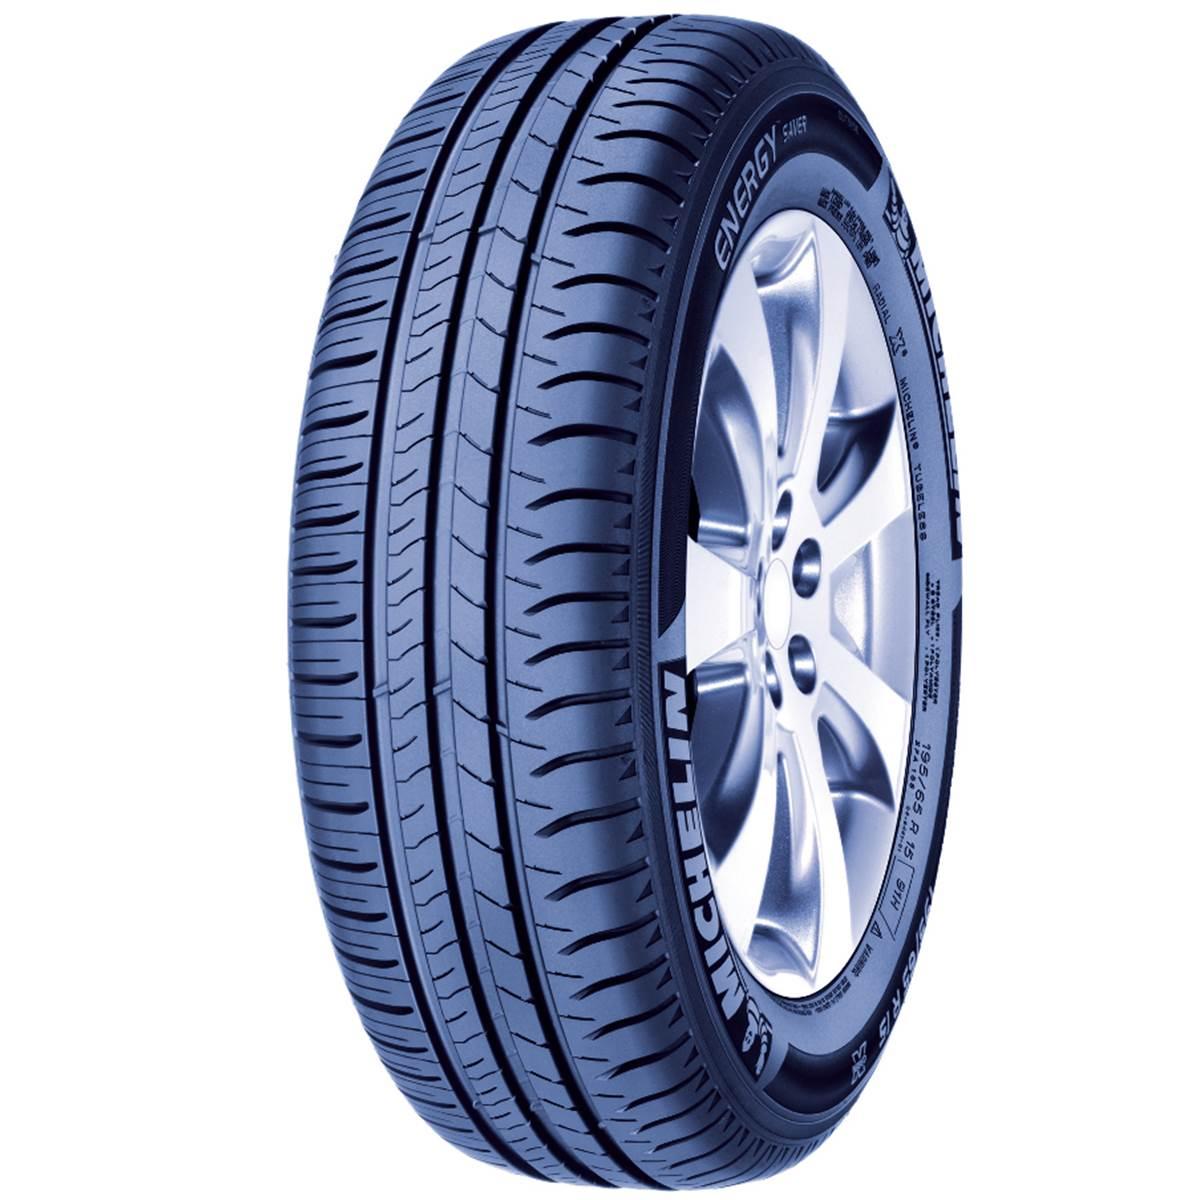 Michelin Energy Saver pneu